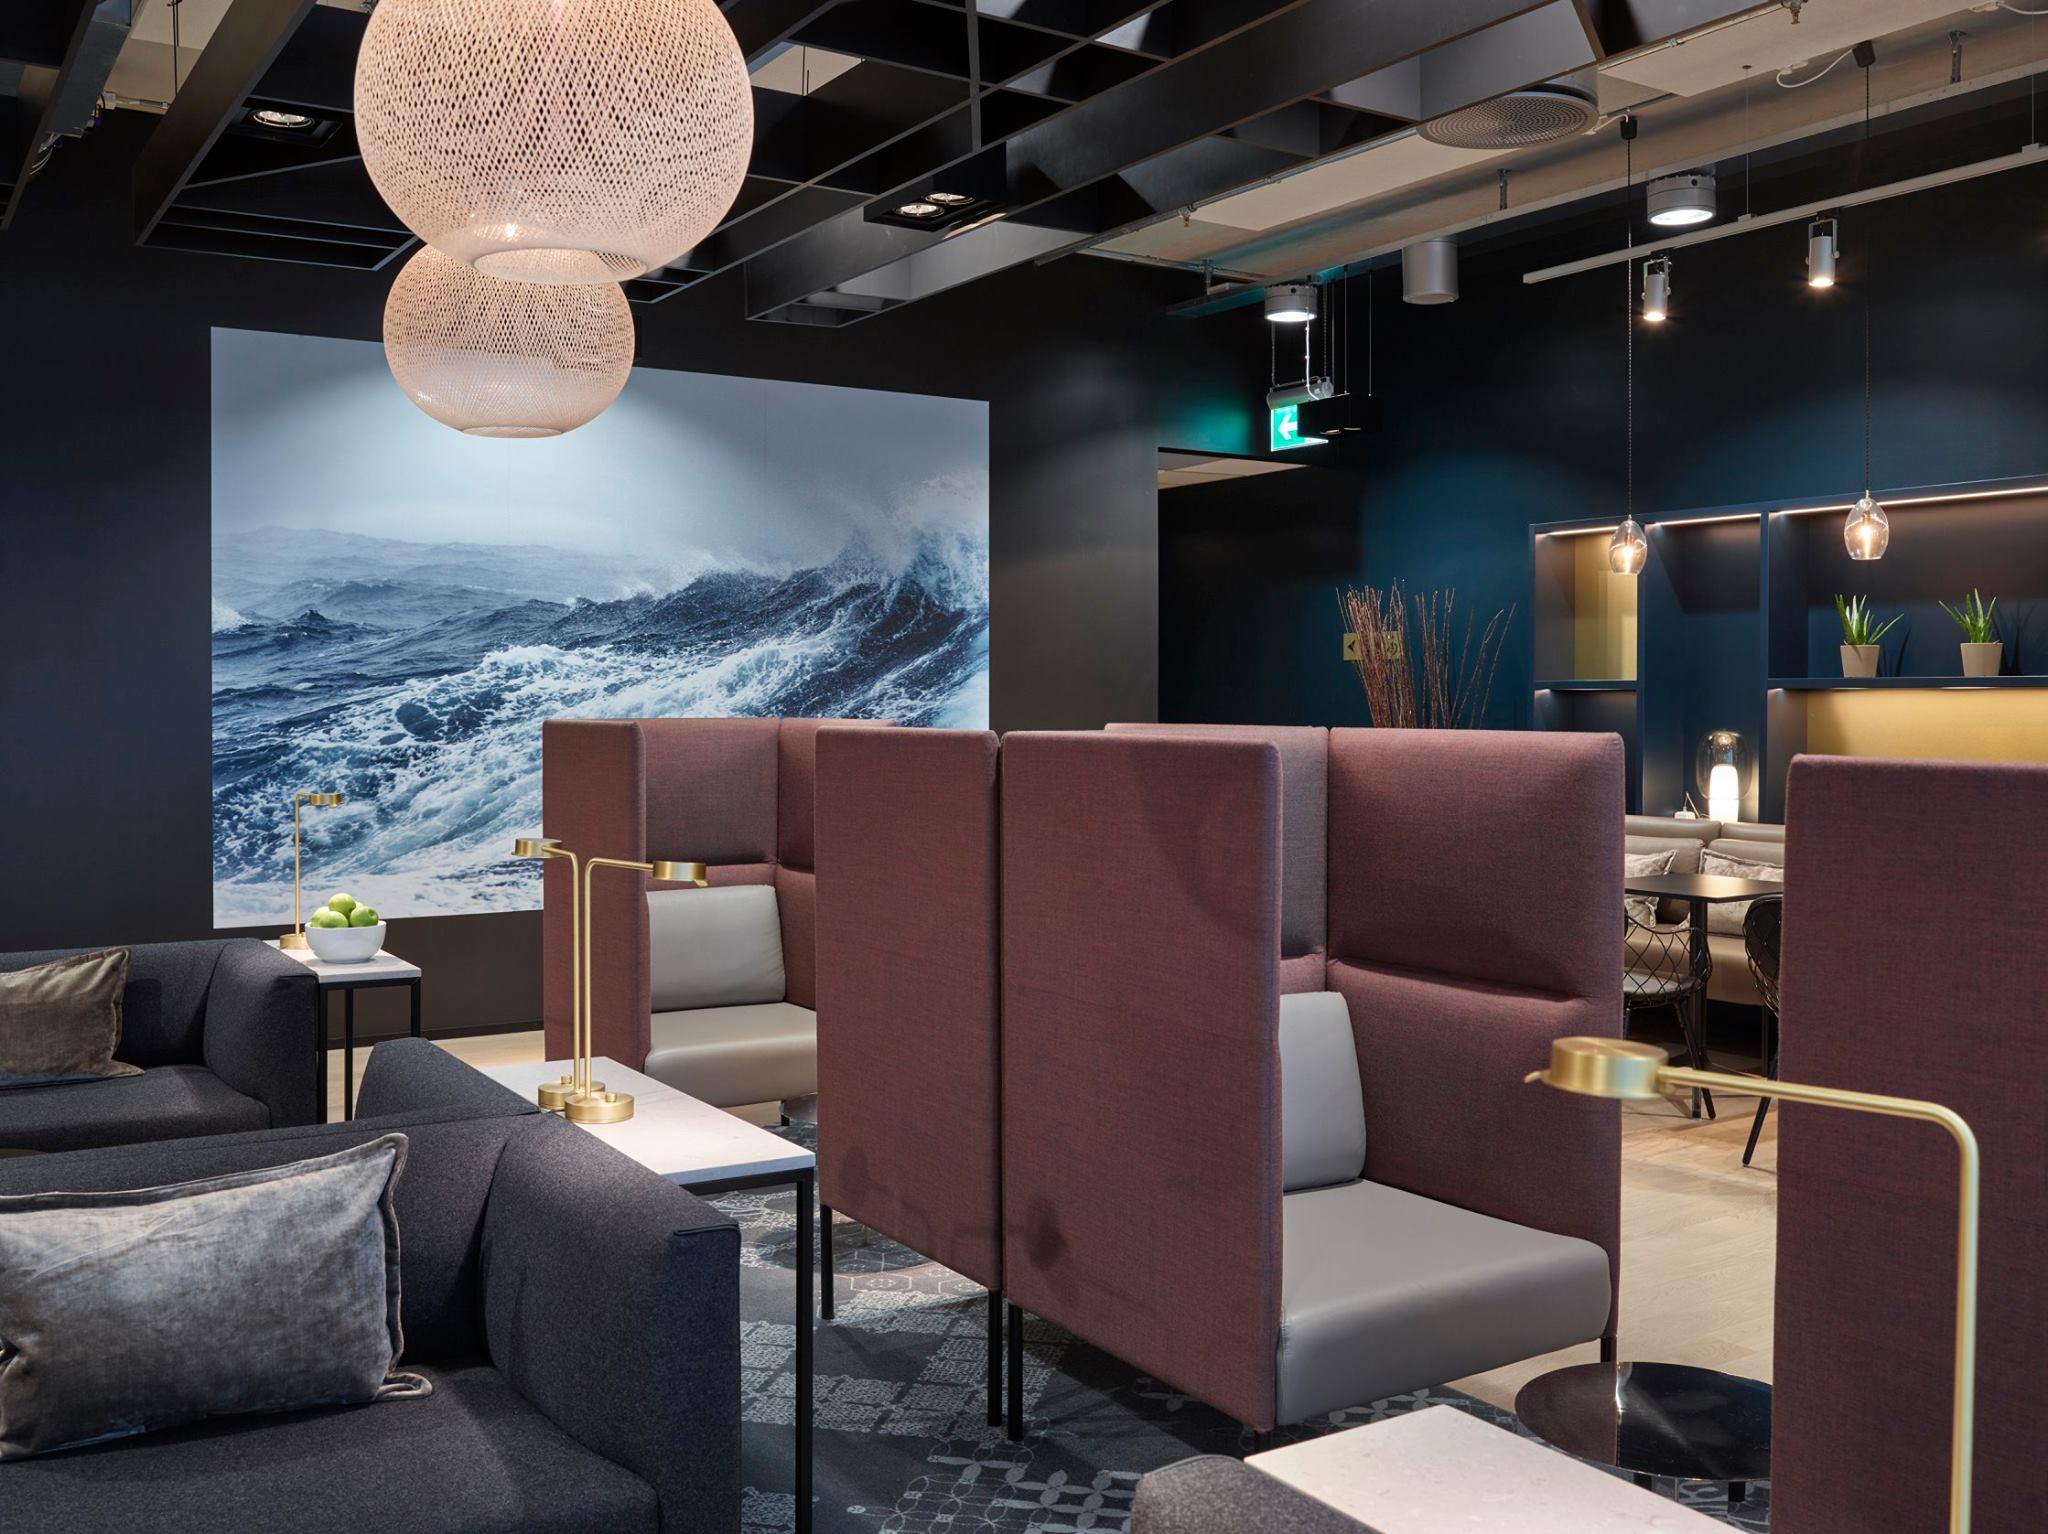 Business+Lounge+Stavanger+Lufthavn+001.jpg